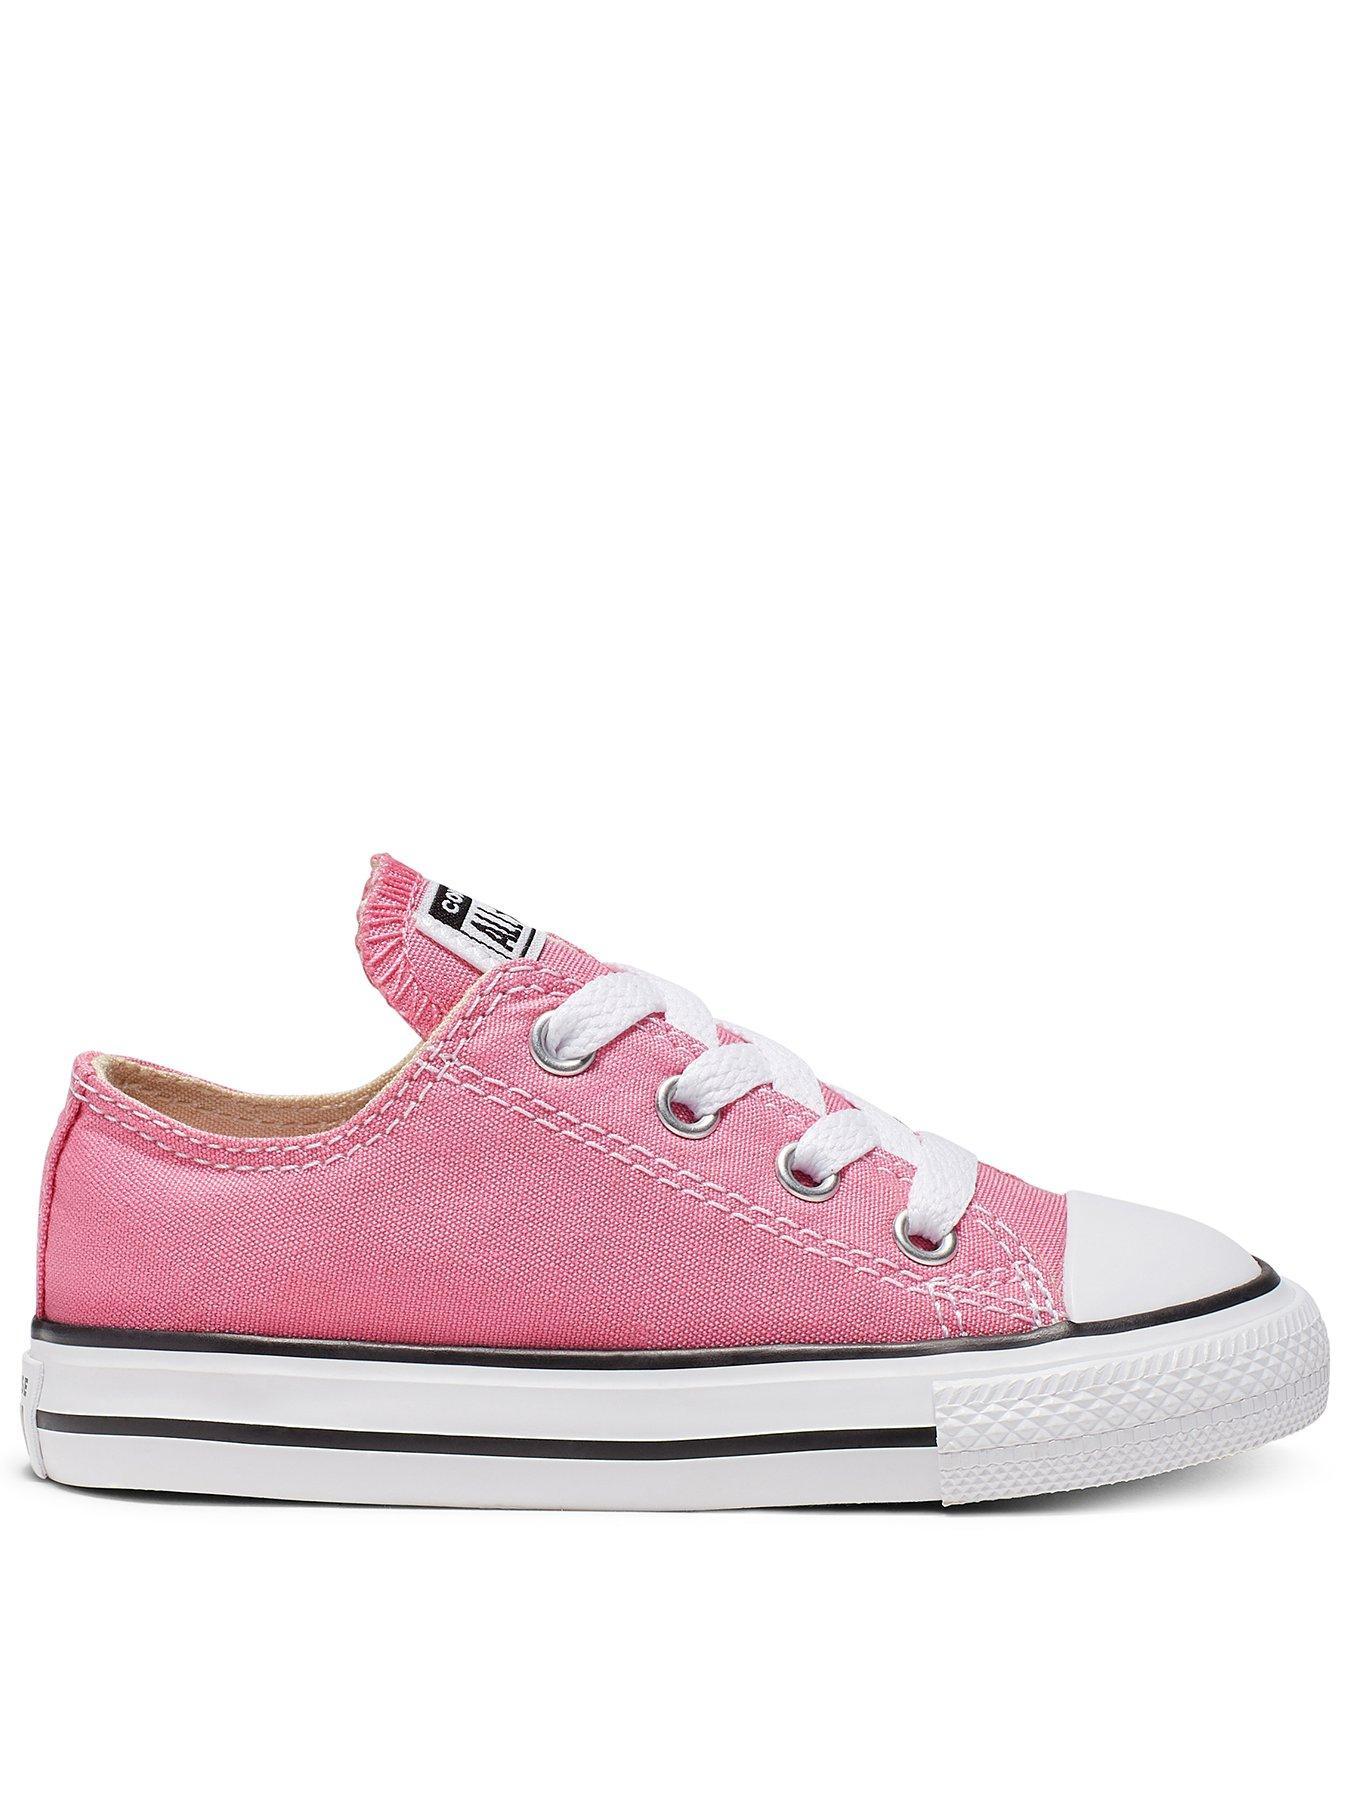 Converse | Trainers | Child \u0026 baby